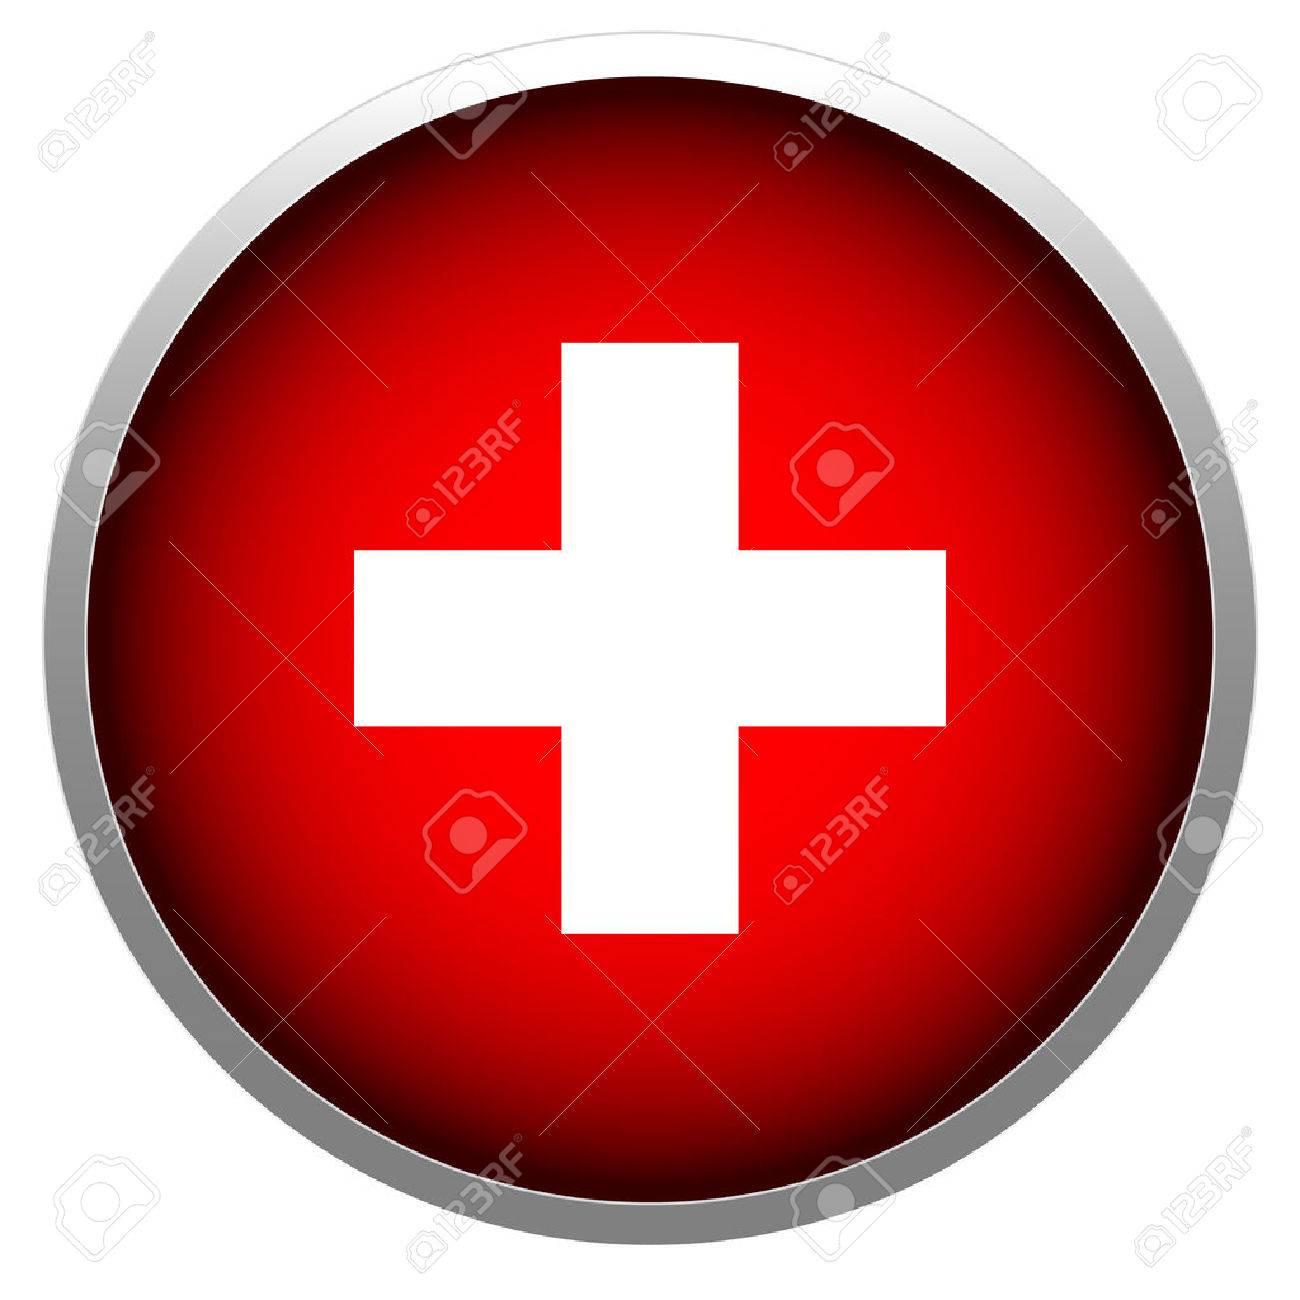 Red cross in sphere stock illustration. Stock Vector - 27876045